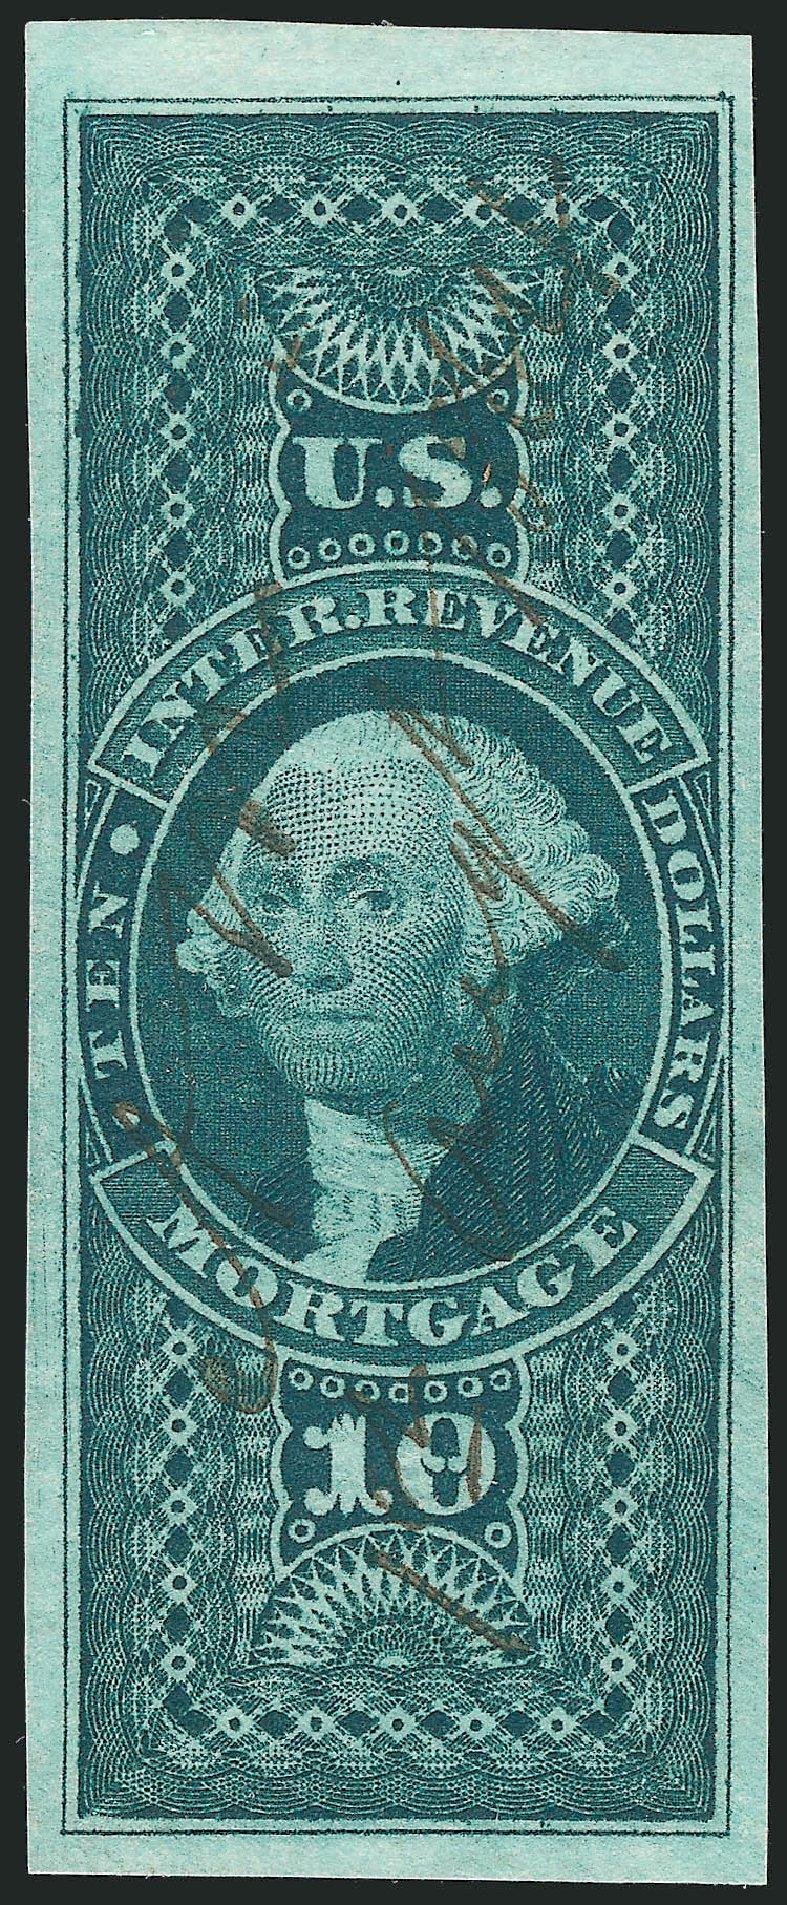 US Stamp Value Scott Catalog # R95 - US$10.00 1862 Revenue Mortgage. Robert Siegel Auction Galleries, Feb 2015, Sale 1092, Lot 1501